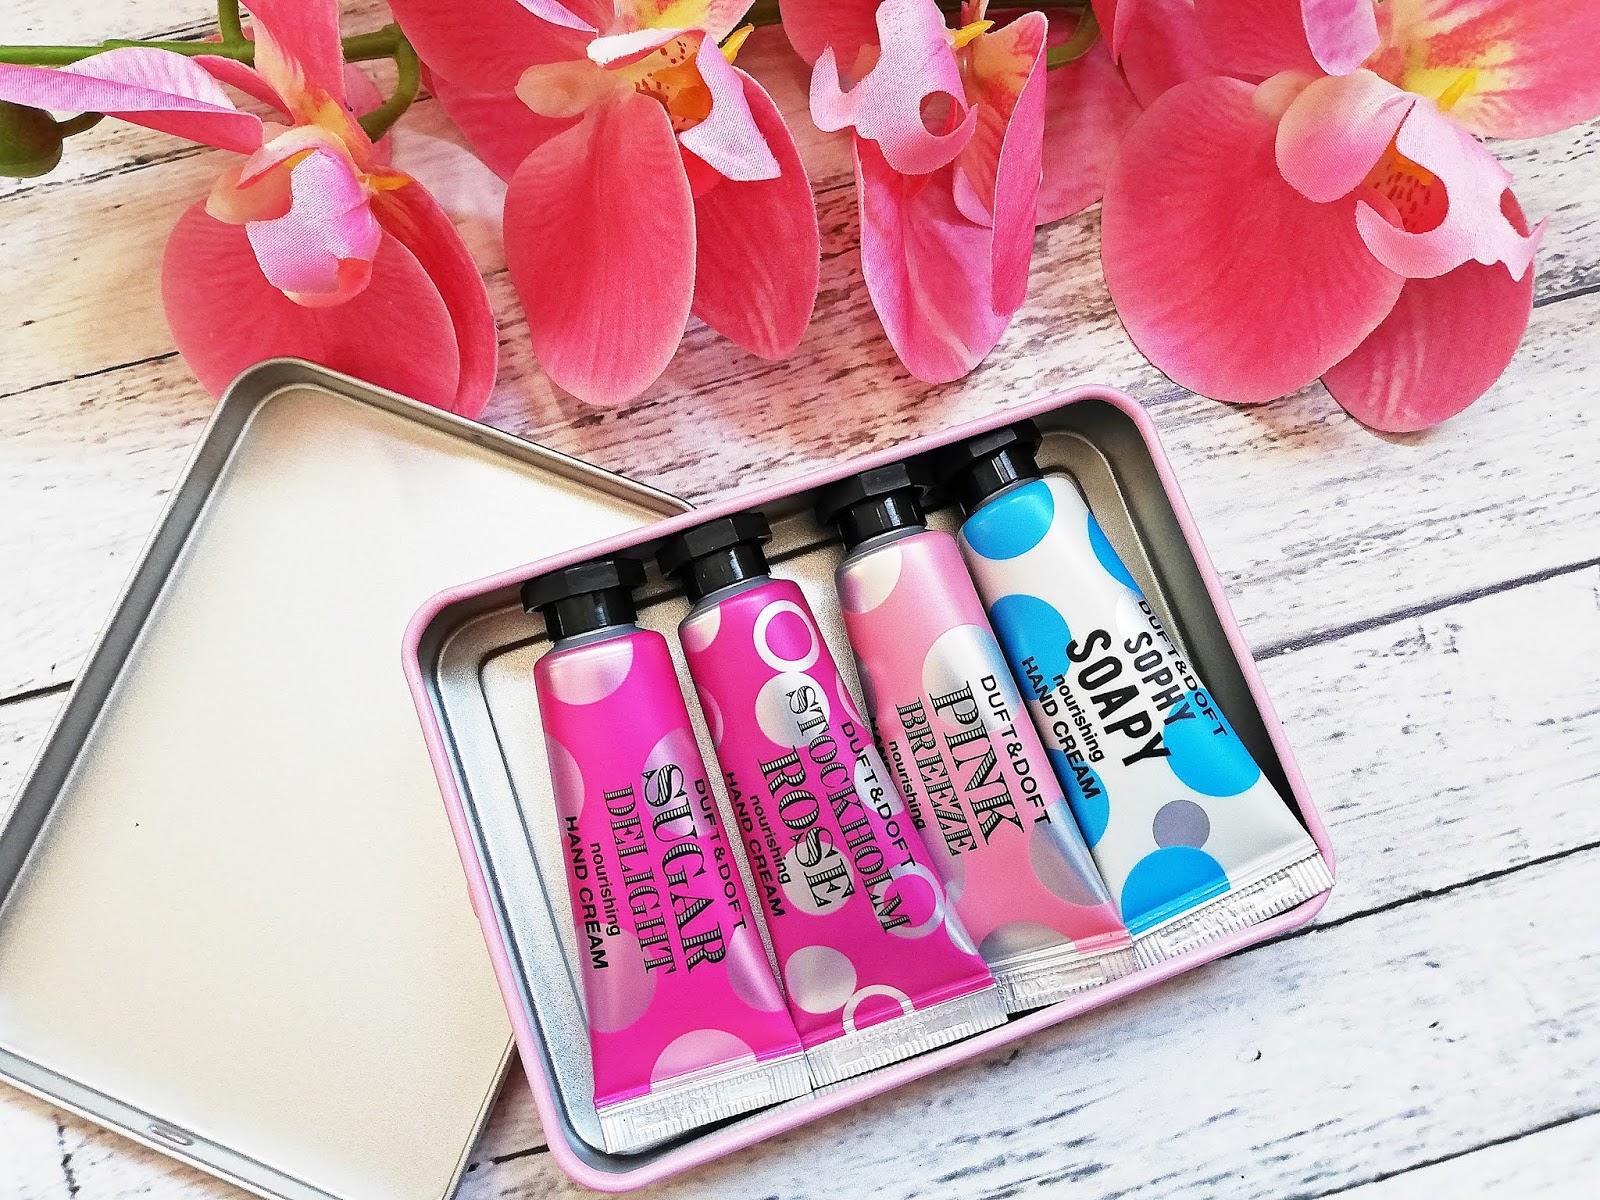 Kremy do rąk Mini Hand Creams Duft & Doft